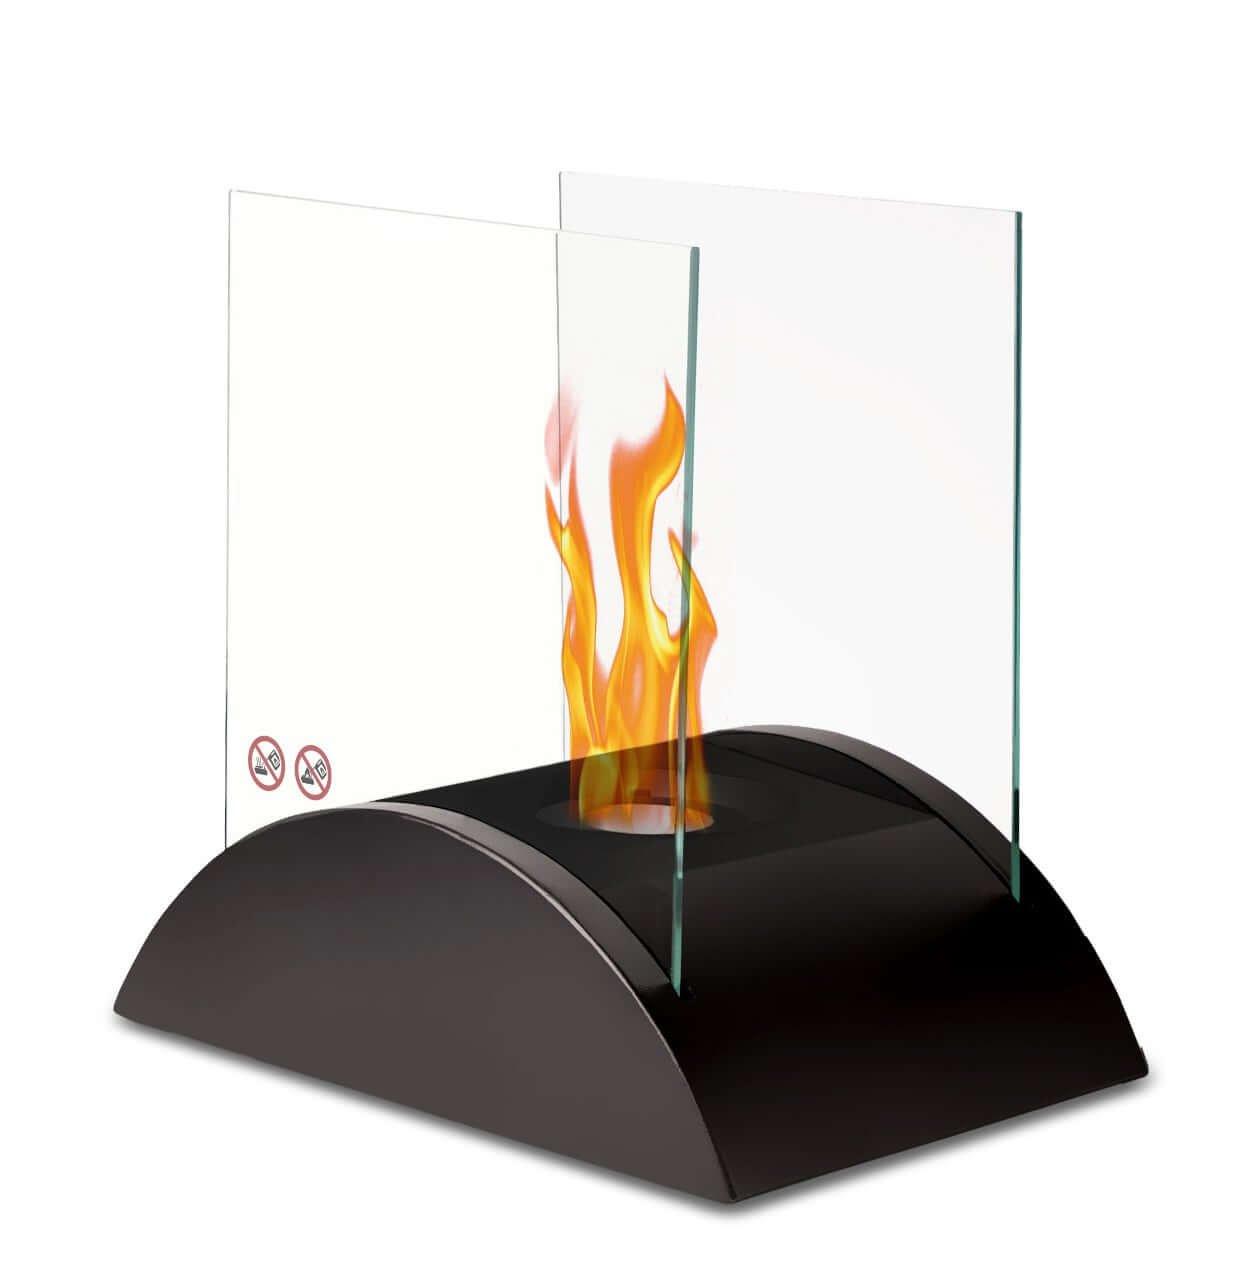 Chimenea de mesa ESENDRA bioetanol con certificado DIN EN 16647 ...